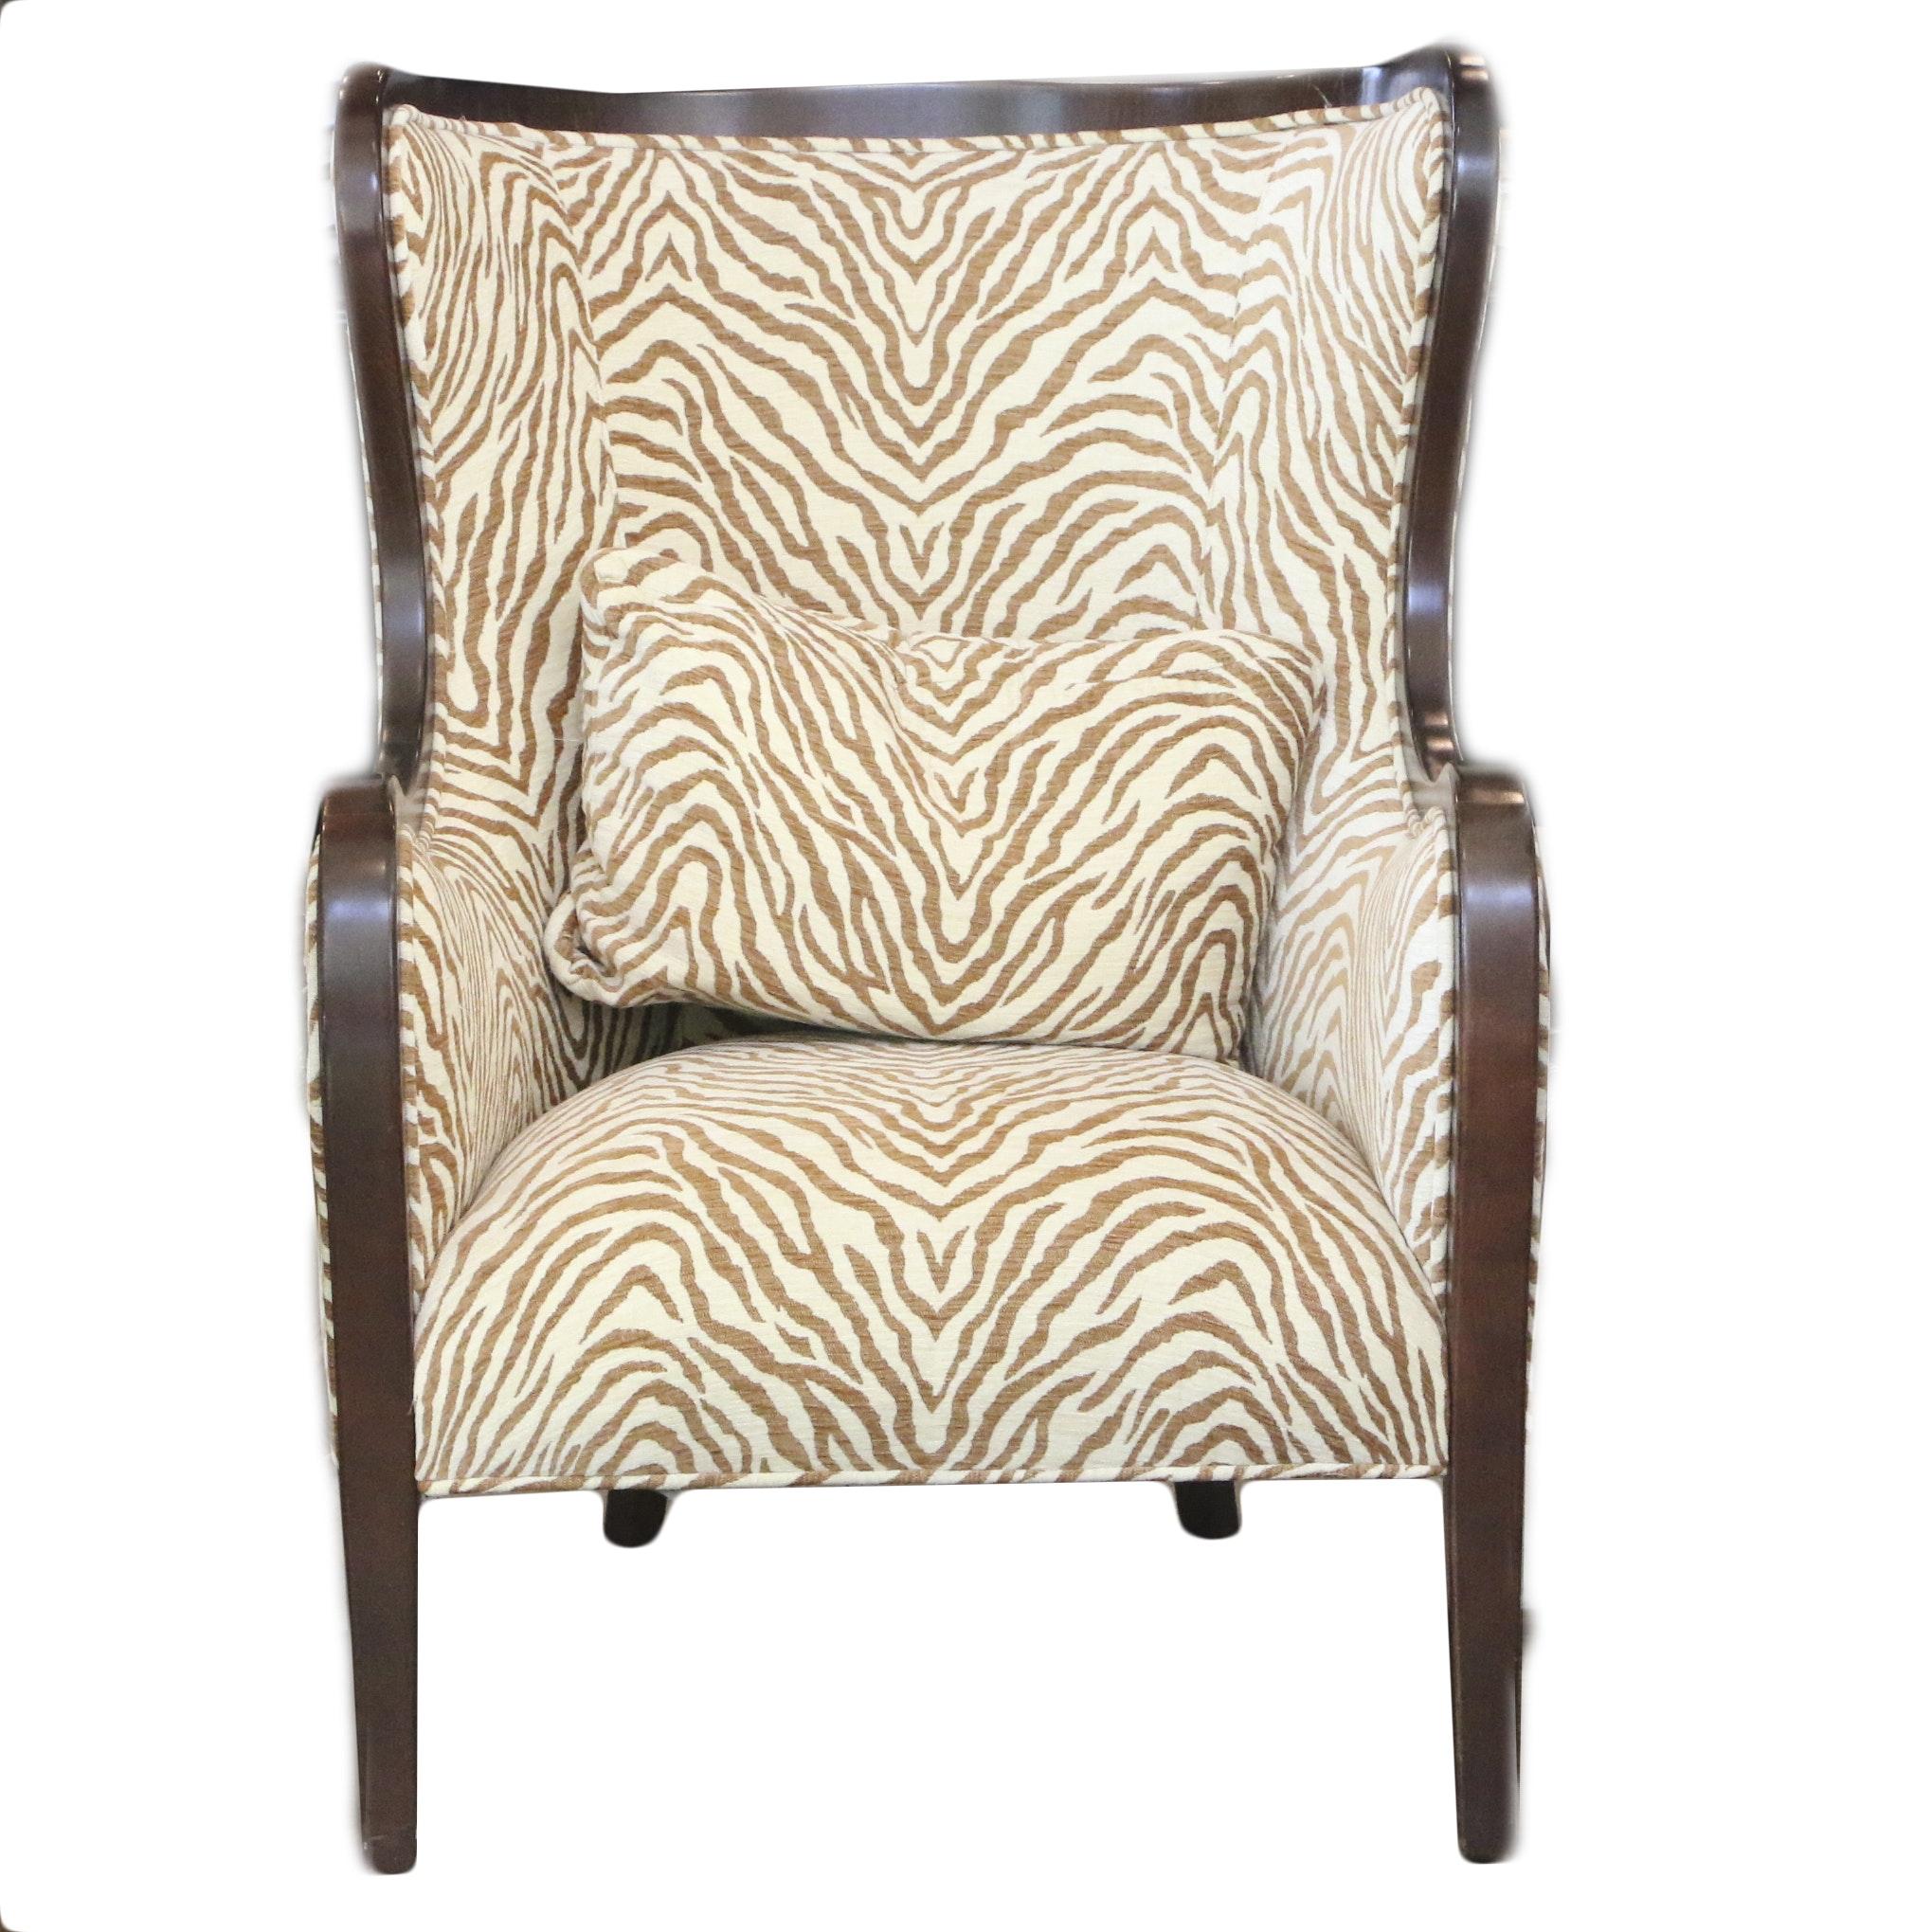 Empire Style Animal Print Upholstered Armchair, 21st Century